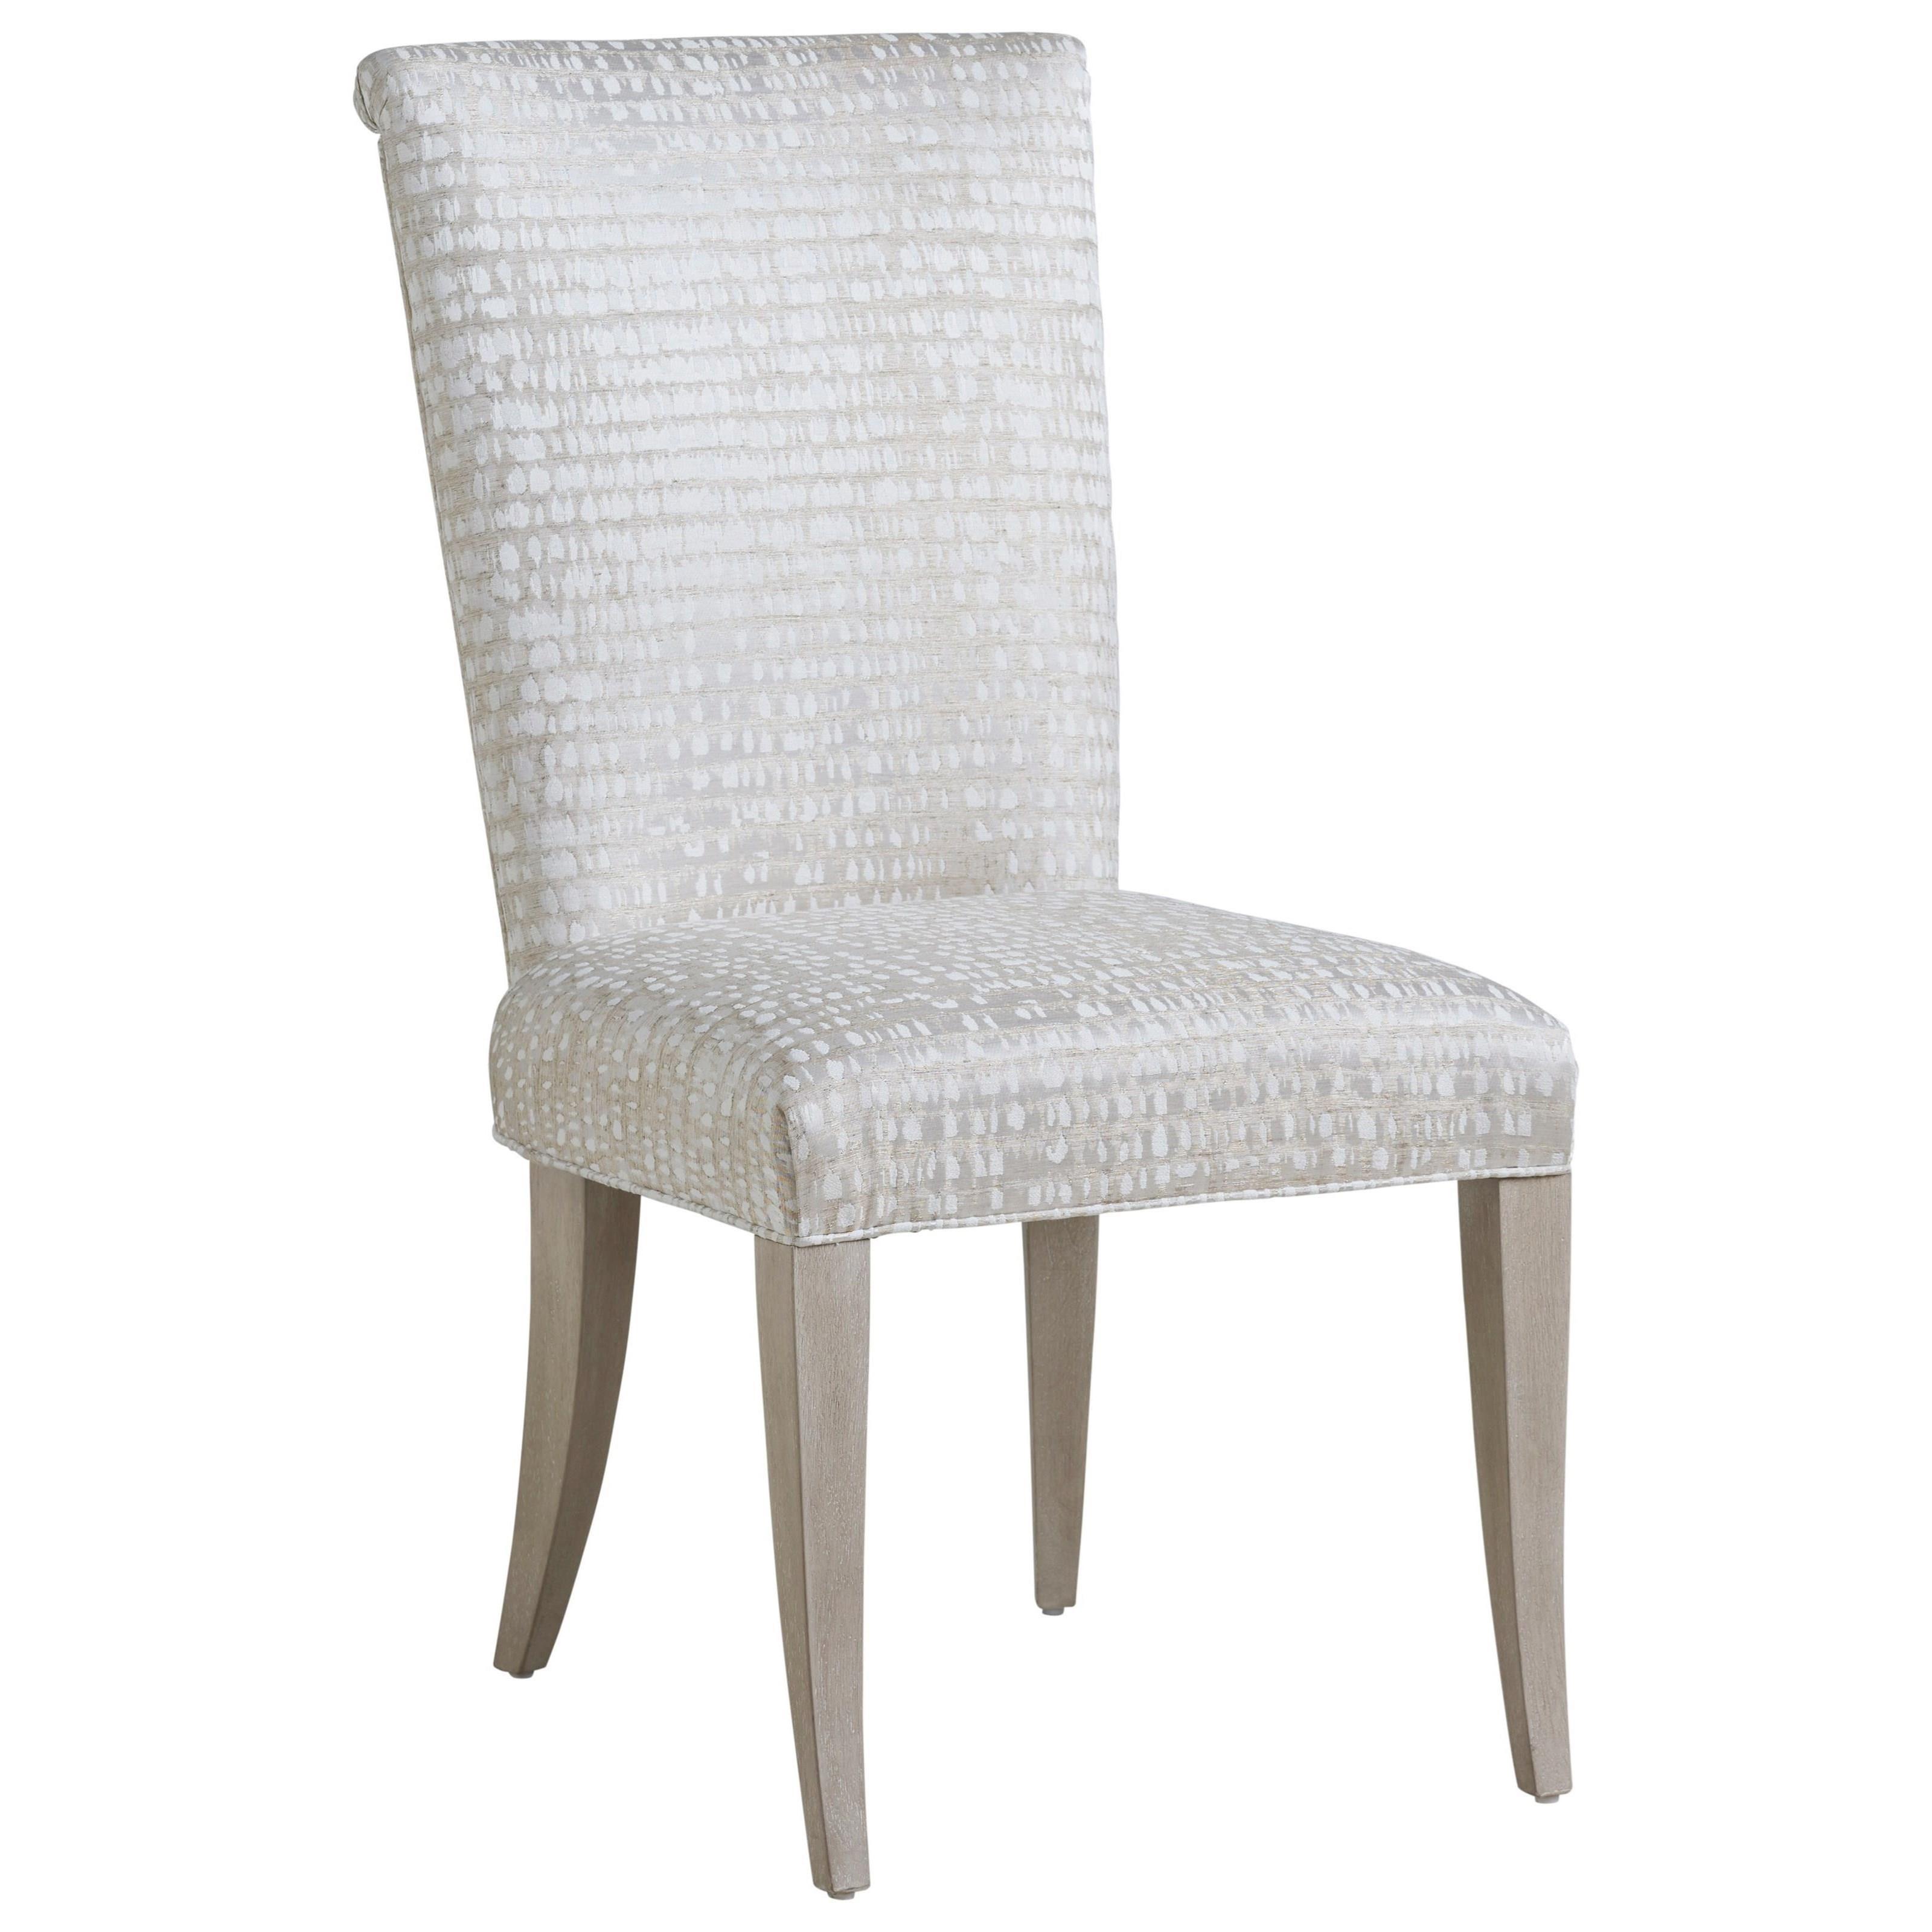 Malibu Serra Upholstered Side Chair by Barclay Butera at Baer's Furniture